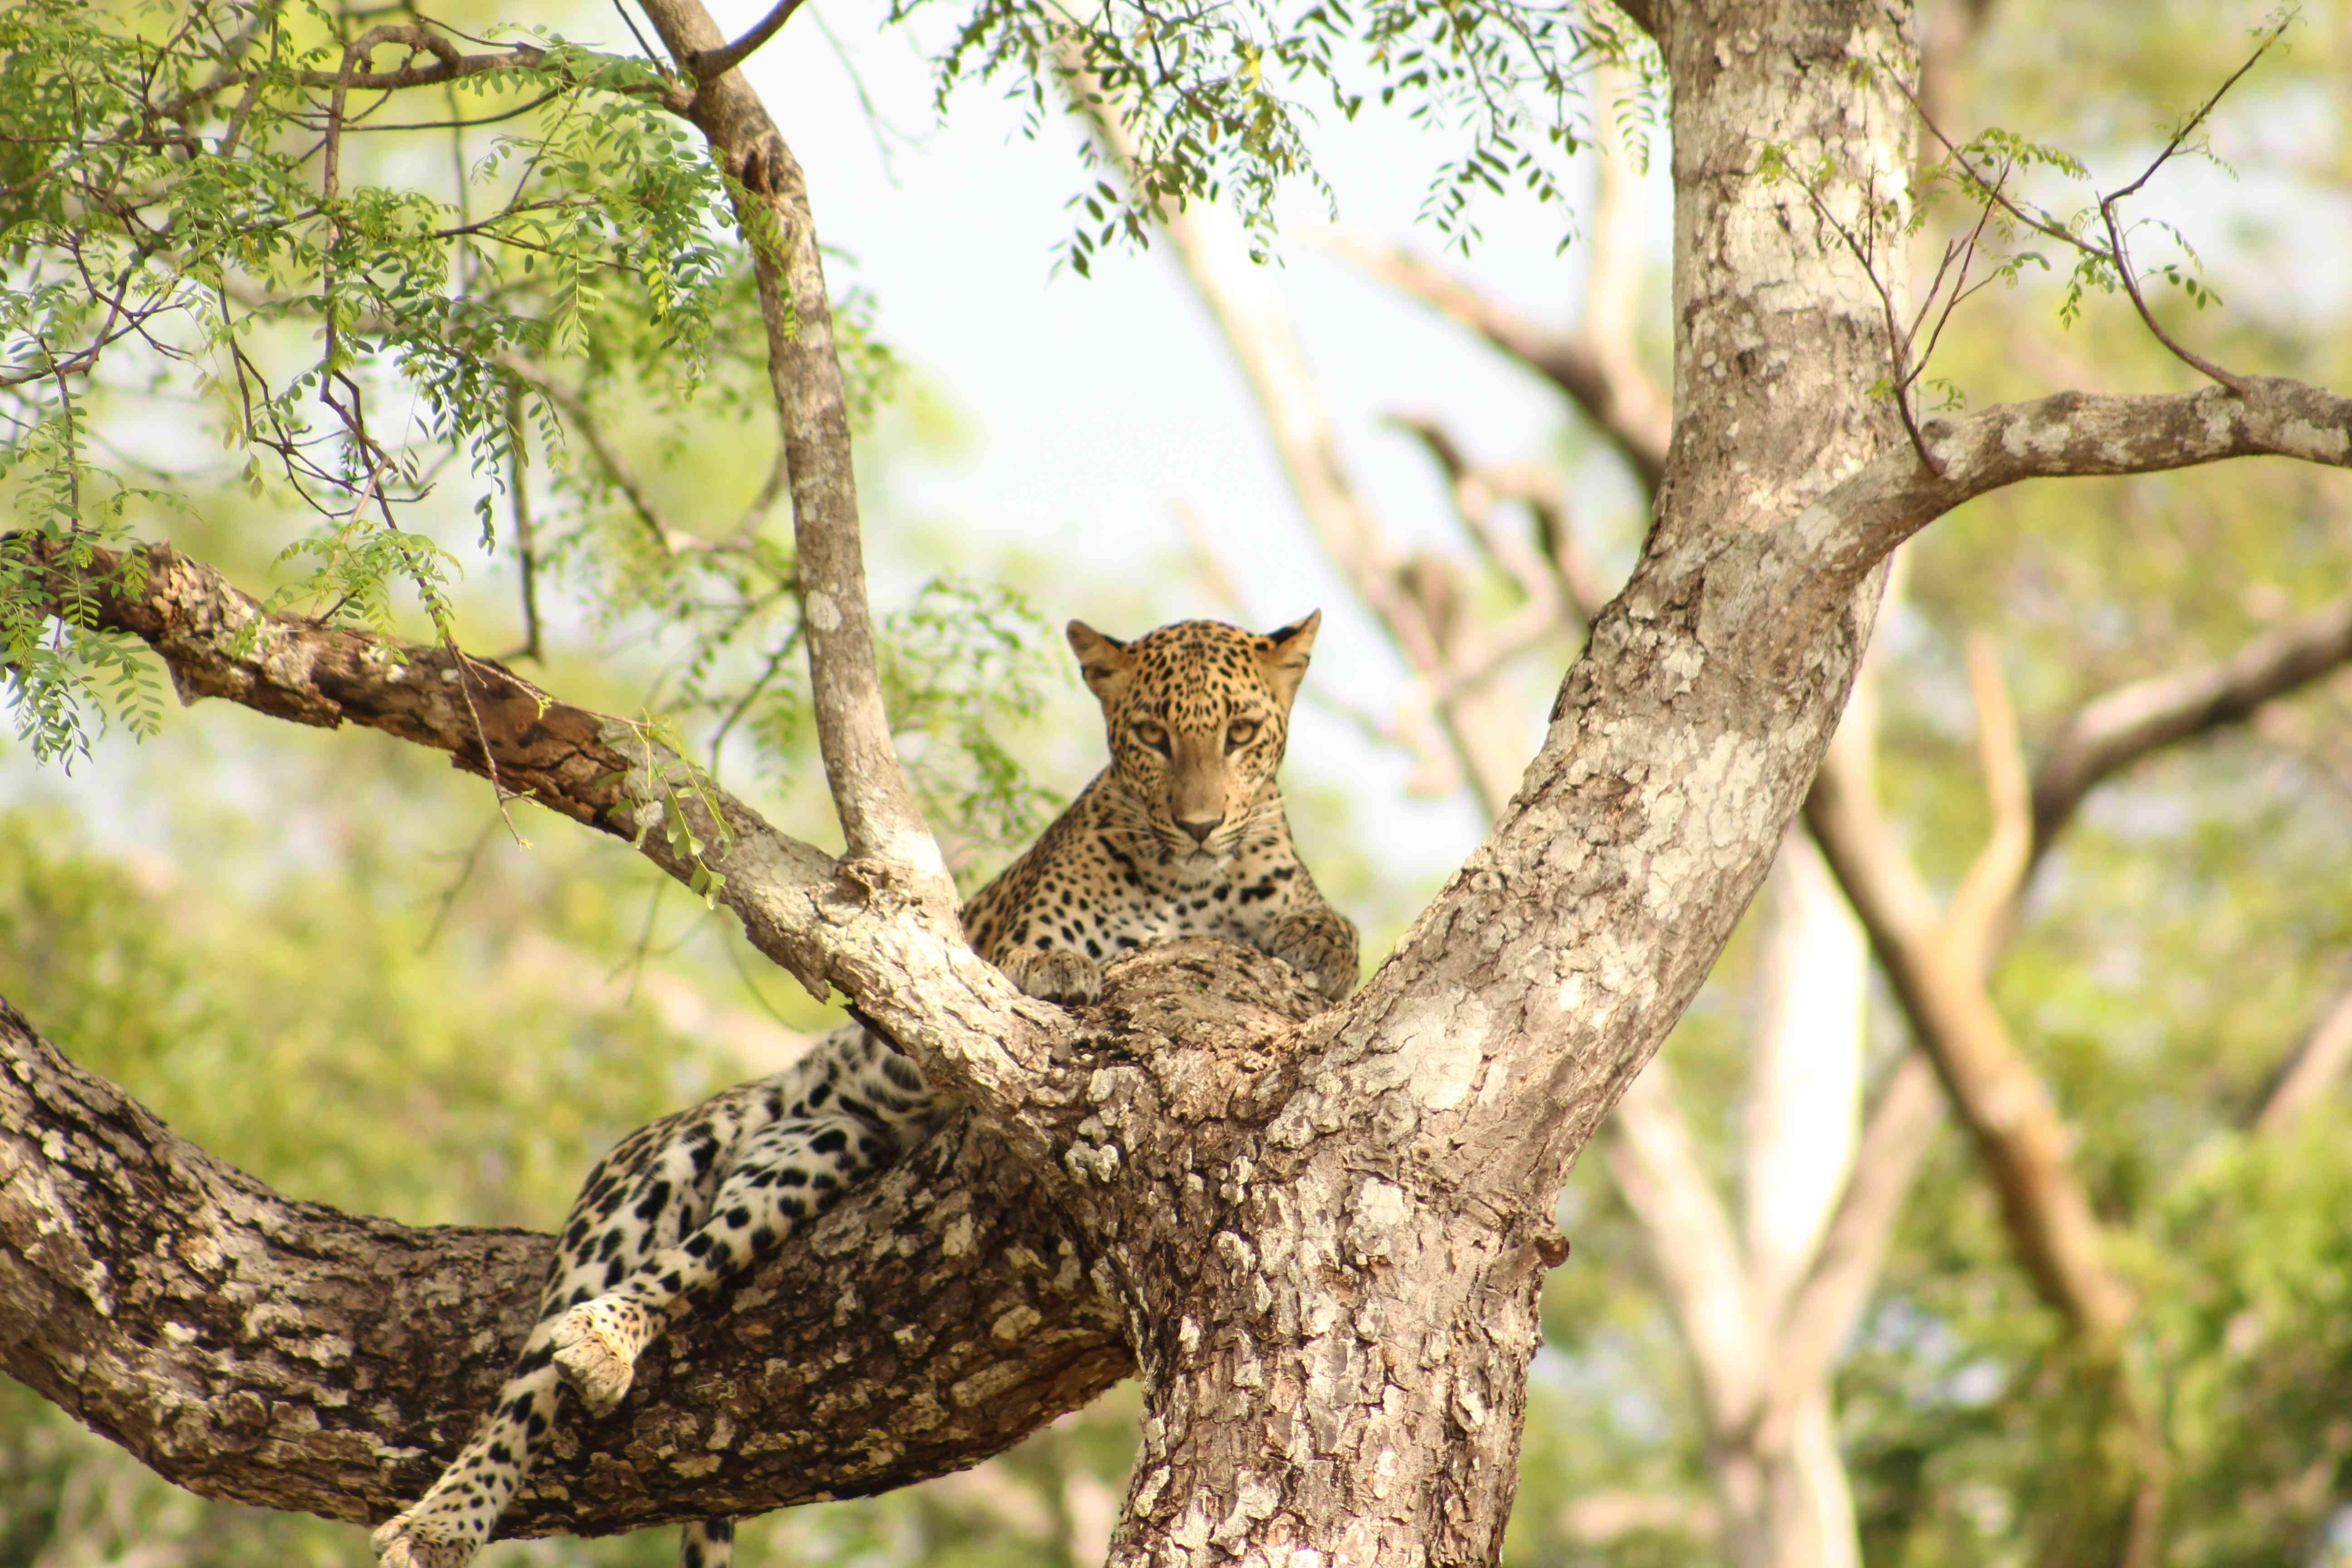 A Leopard in Sri Lanka's Yala National Park